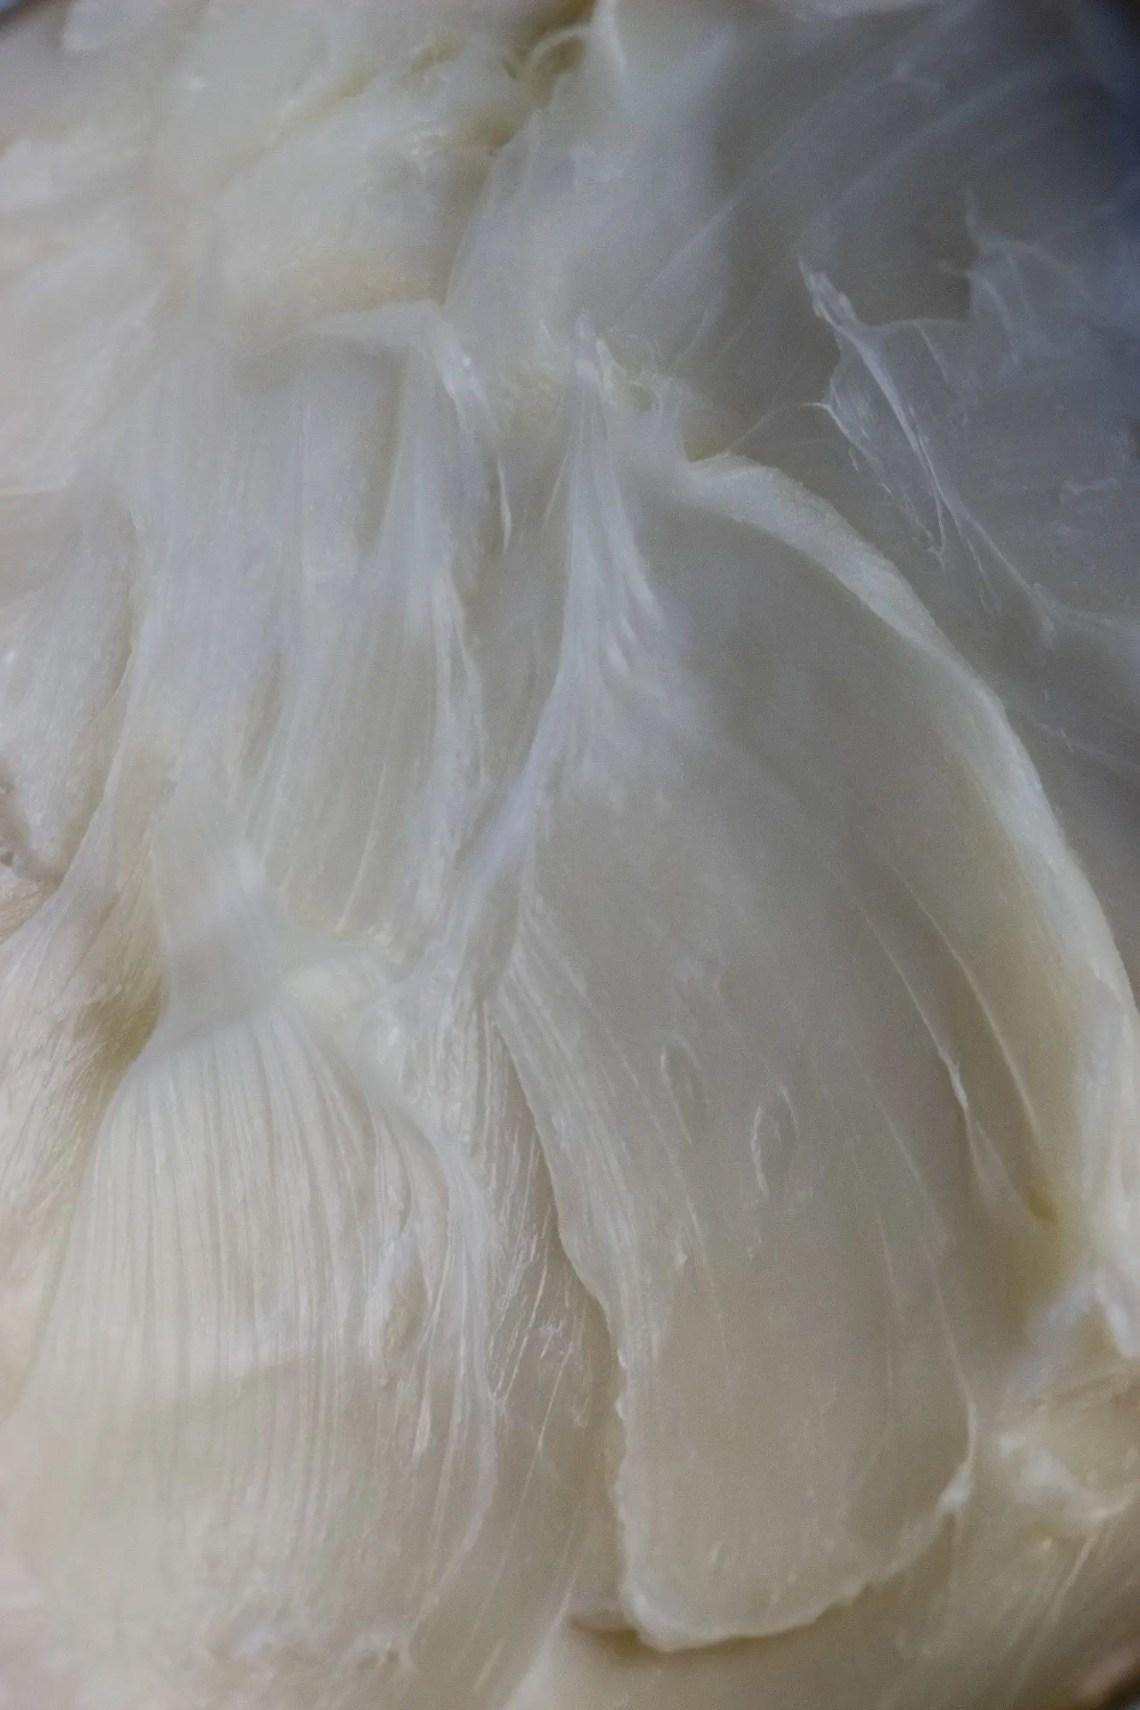 Eu'Genia Shea butter texture up close